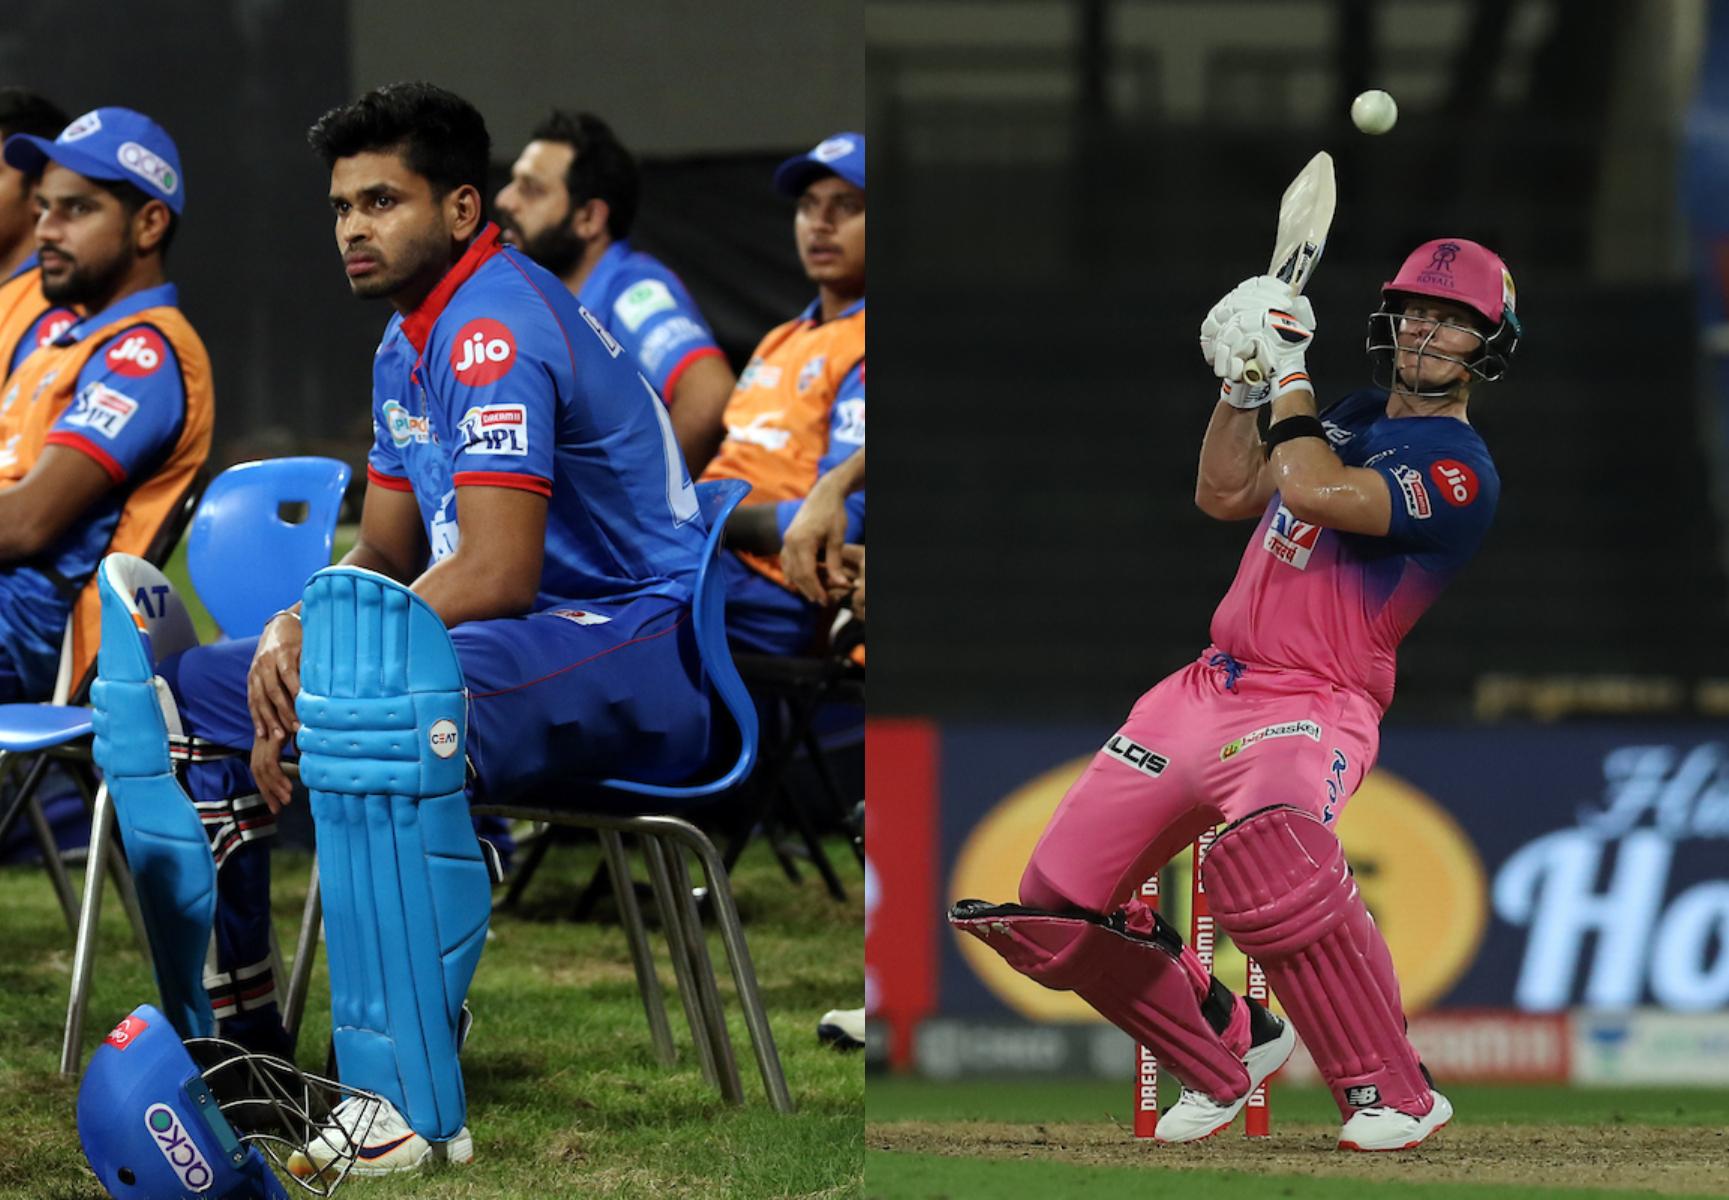 Delhi Capitals had beaten Rajasthan Royals by 46 runs earlier in IPL 13 in Sharjah | BCCI/IPL